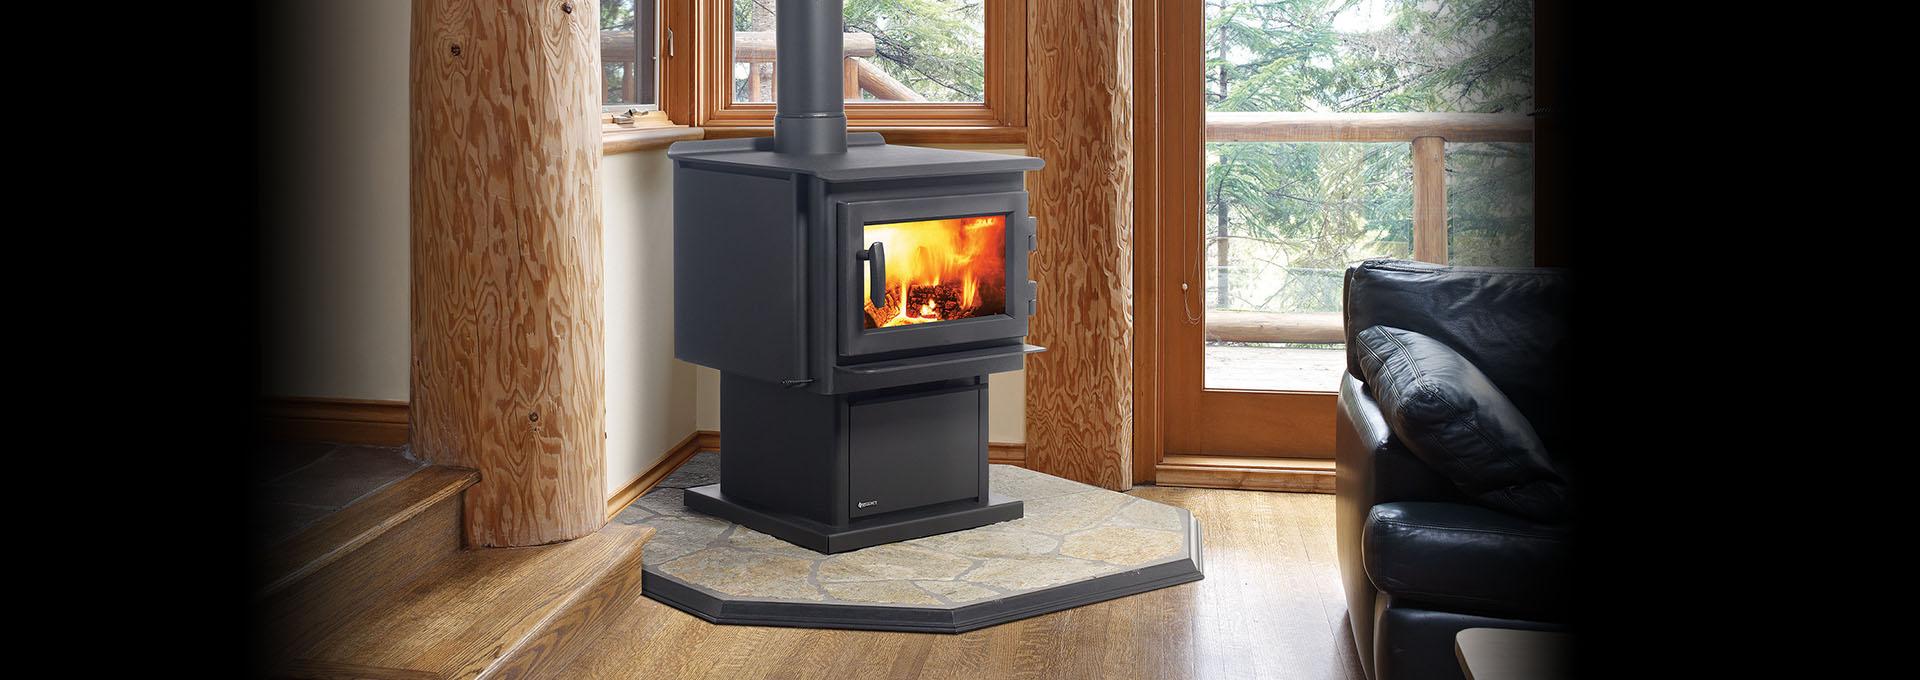 Classic F2400 Freestanding Wood Burning Stove Regency